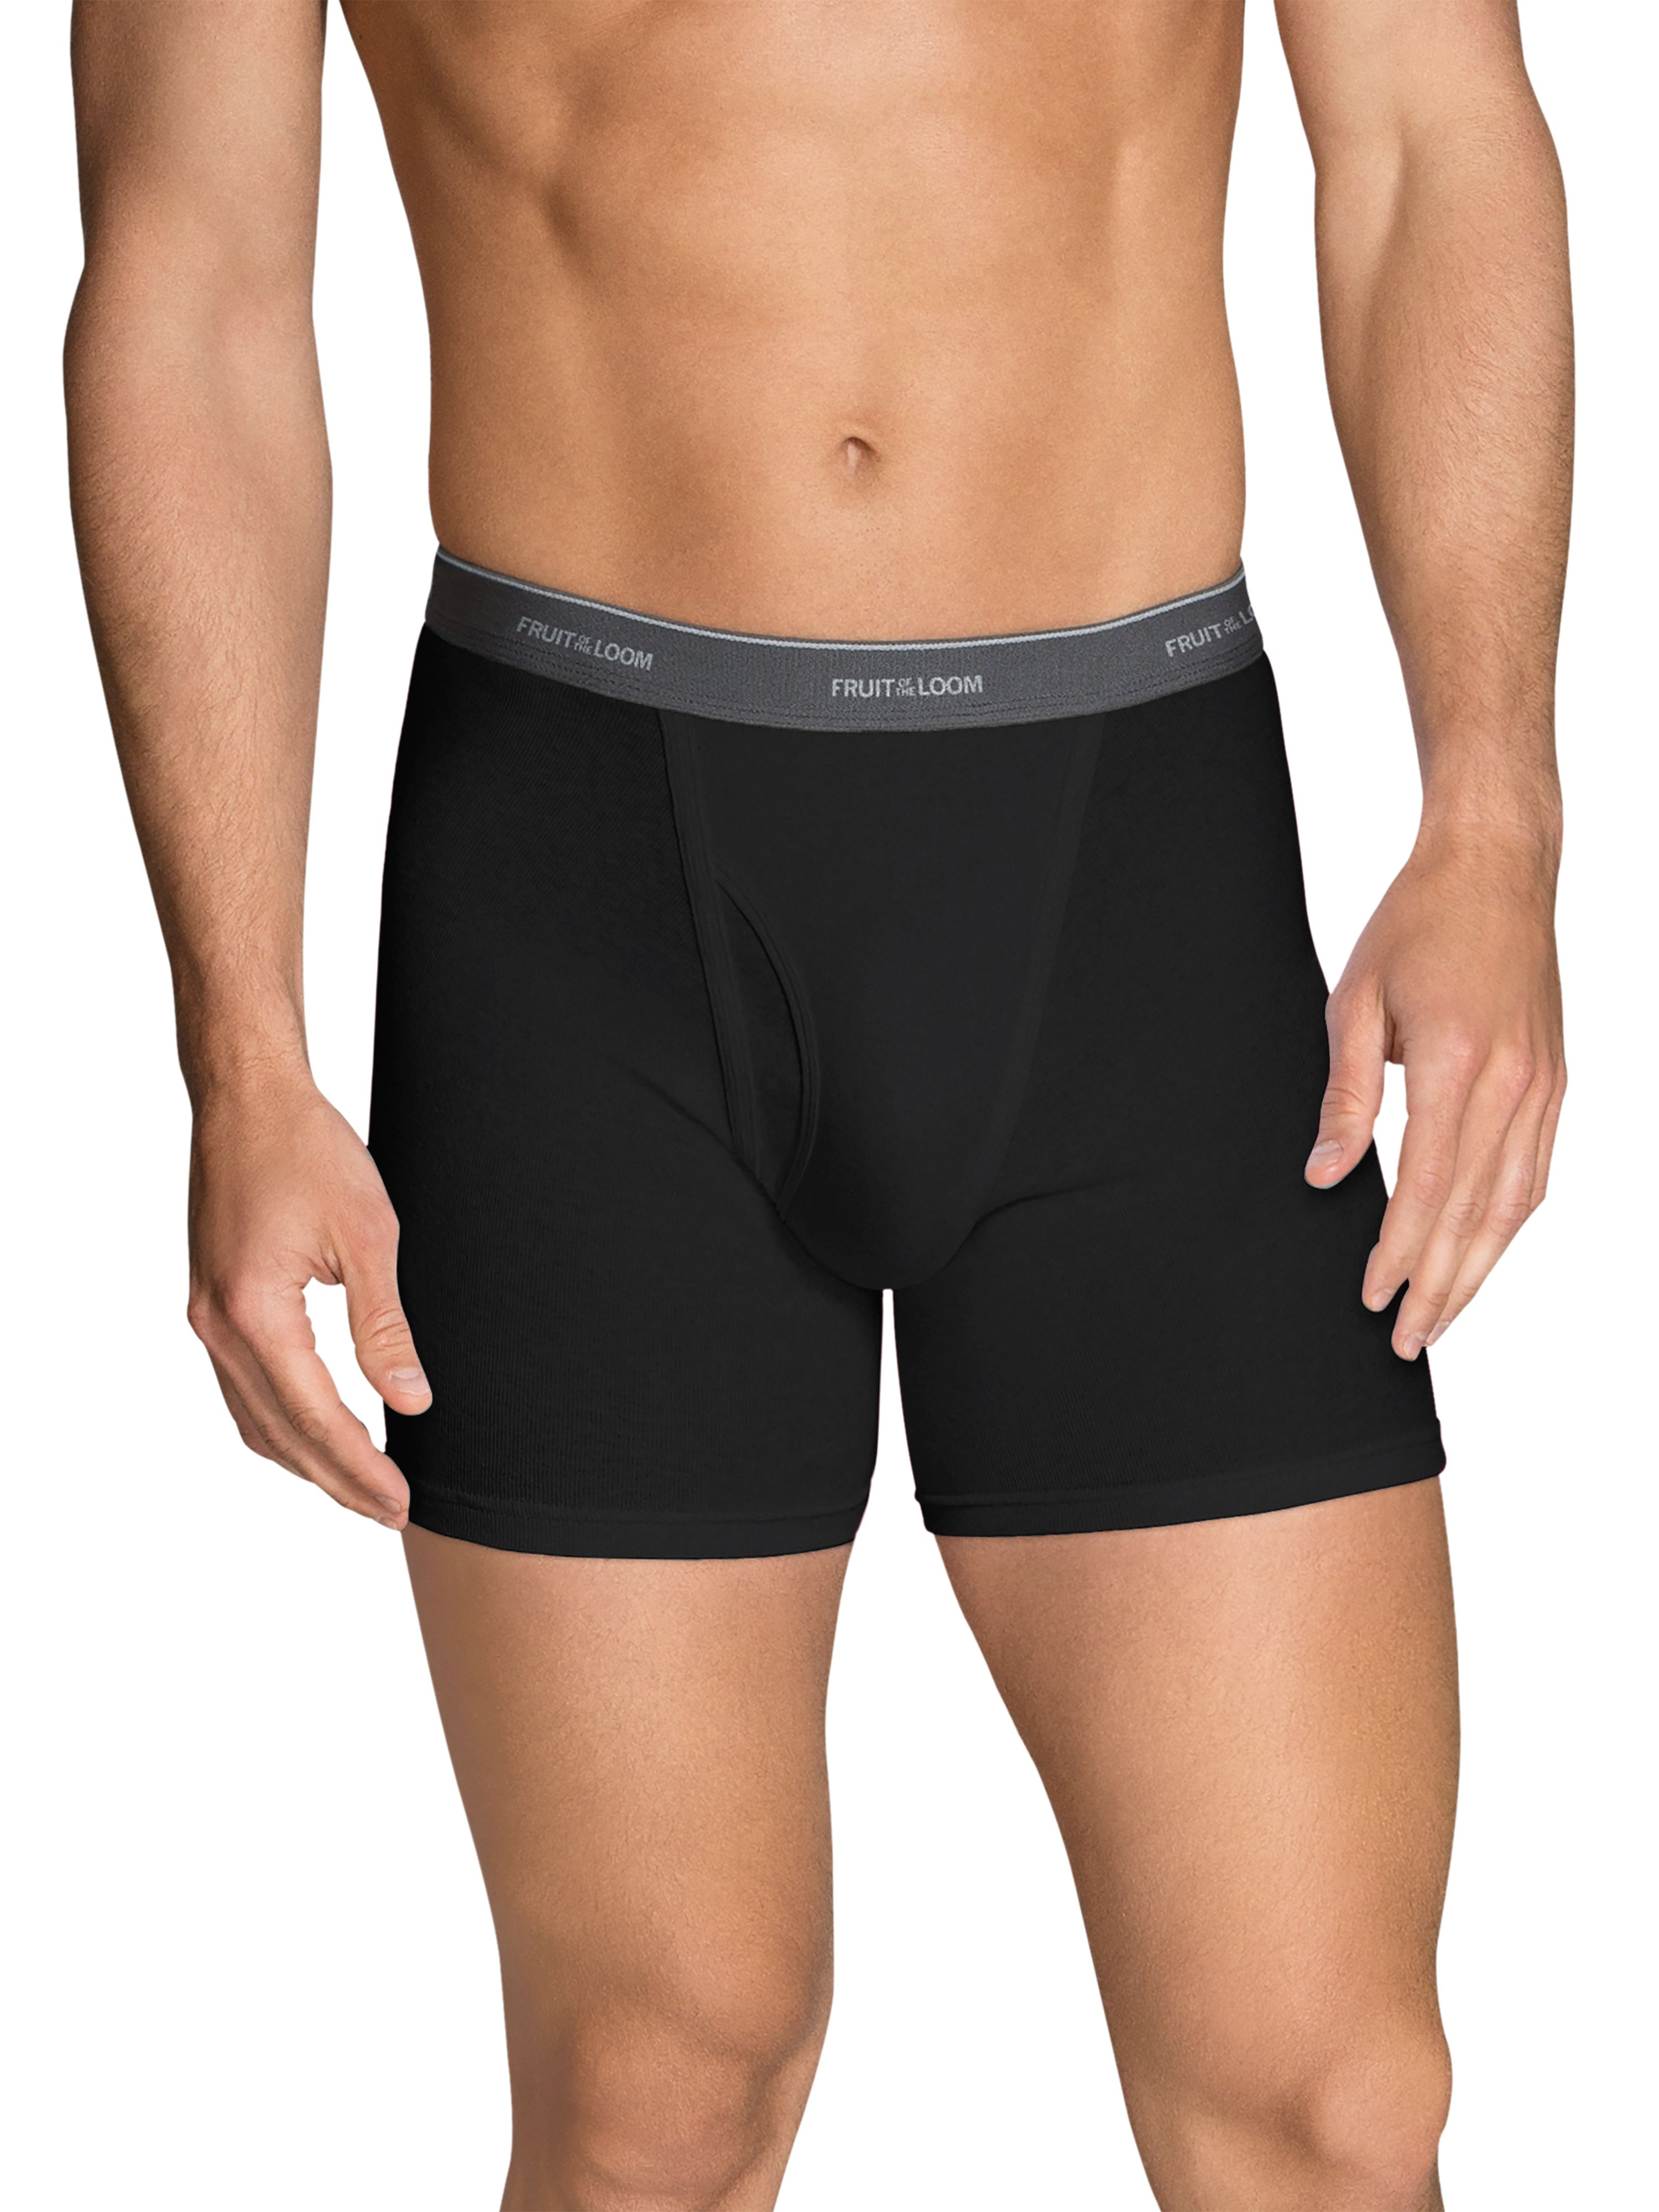 Men's Dual Defense Black/Gray Short Leg Boxer Briefs, 5 Pack